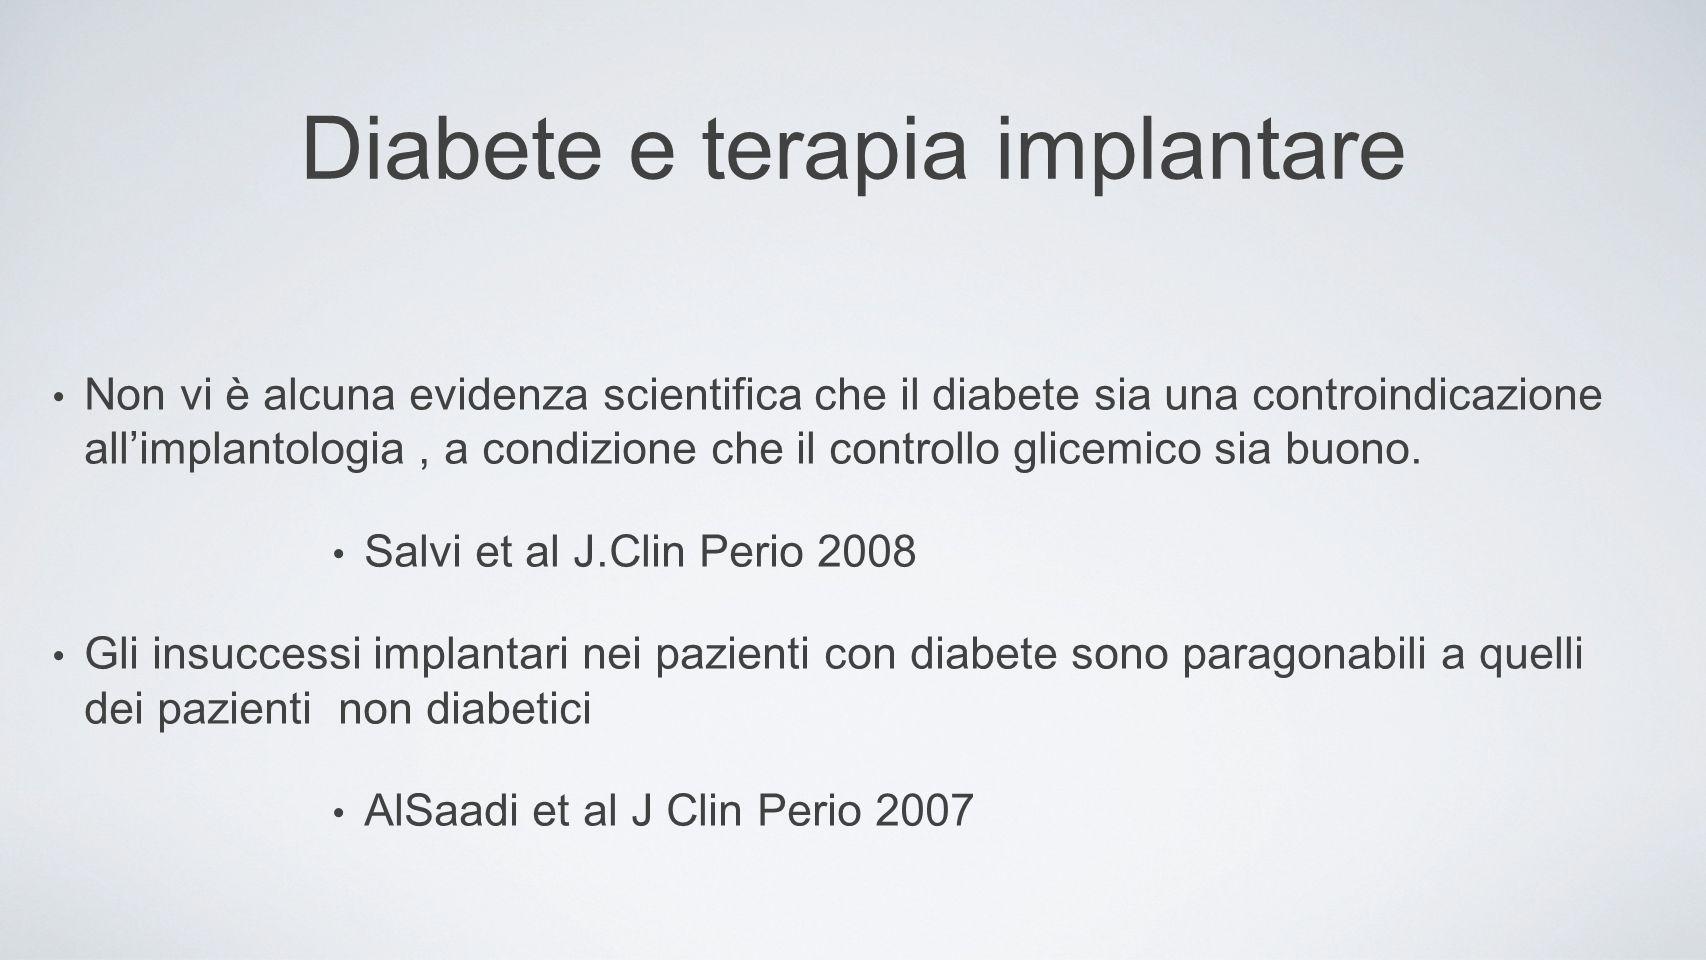 Diabete e terapia implantare